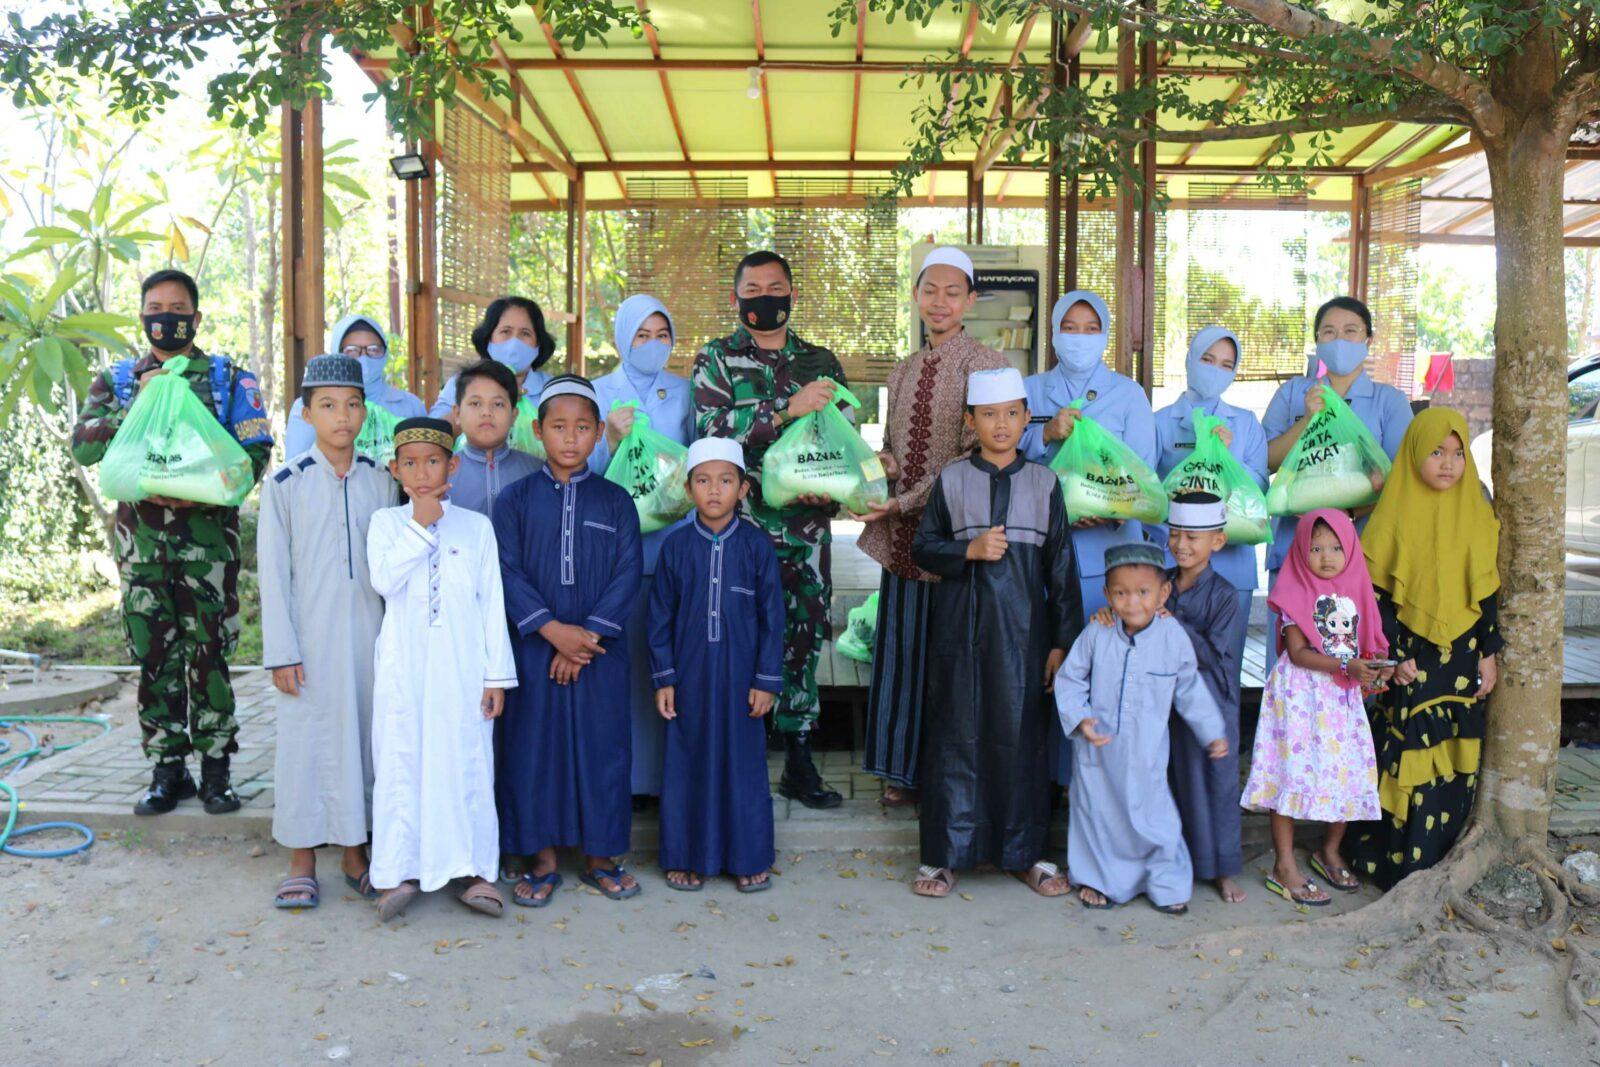 Berbagi dan Saling Peduli Antar Sesama , PIA AG Cab.11/D.II Lanud Sjamsudin Noor Anjangsana Ke Rumah Anak Yatim Ar-Rohman Banjarbaru